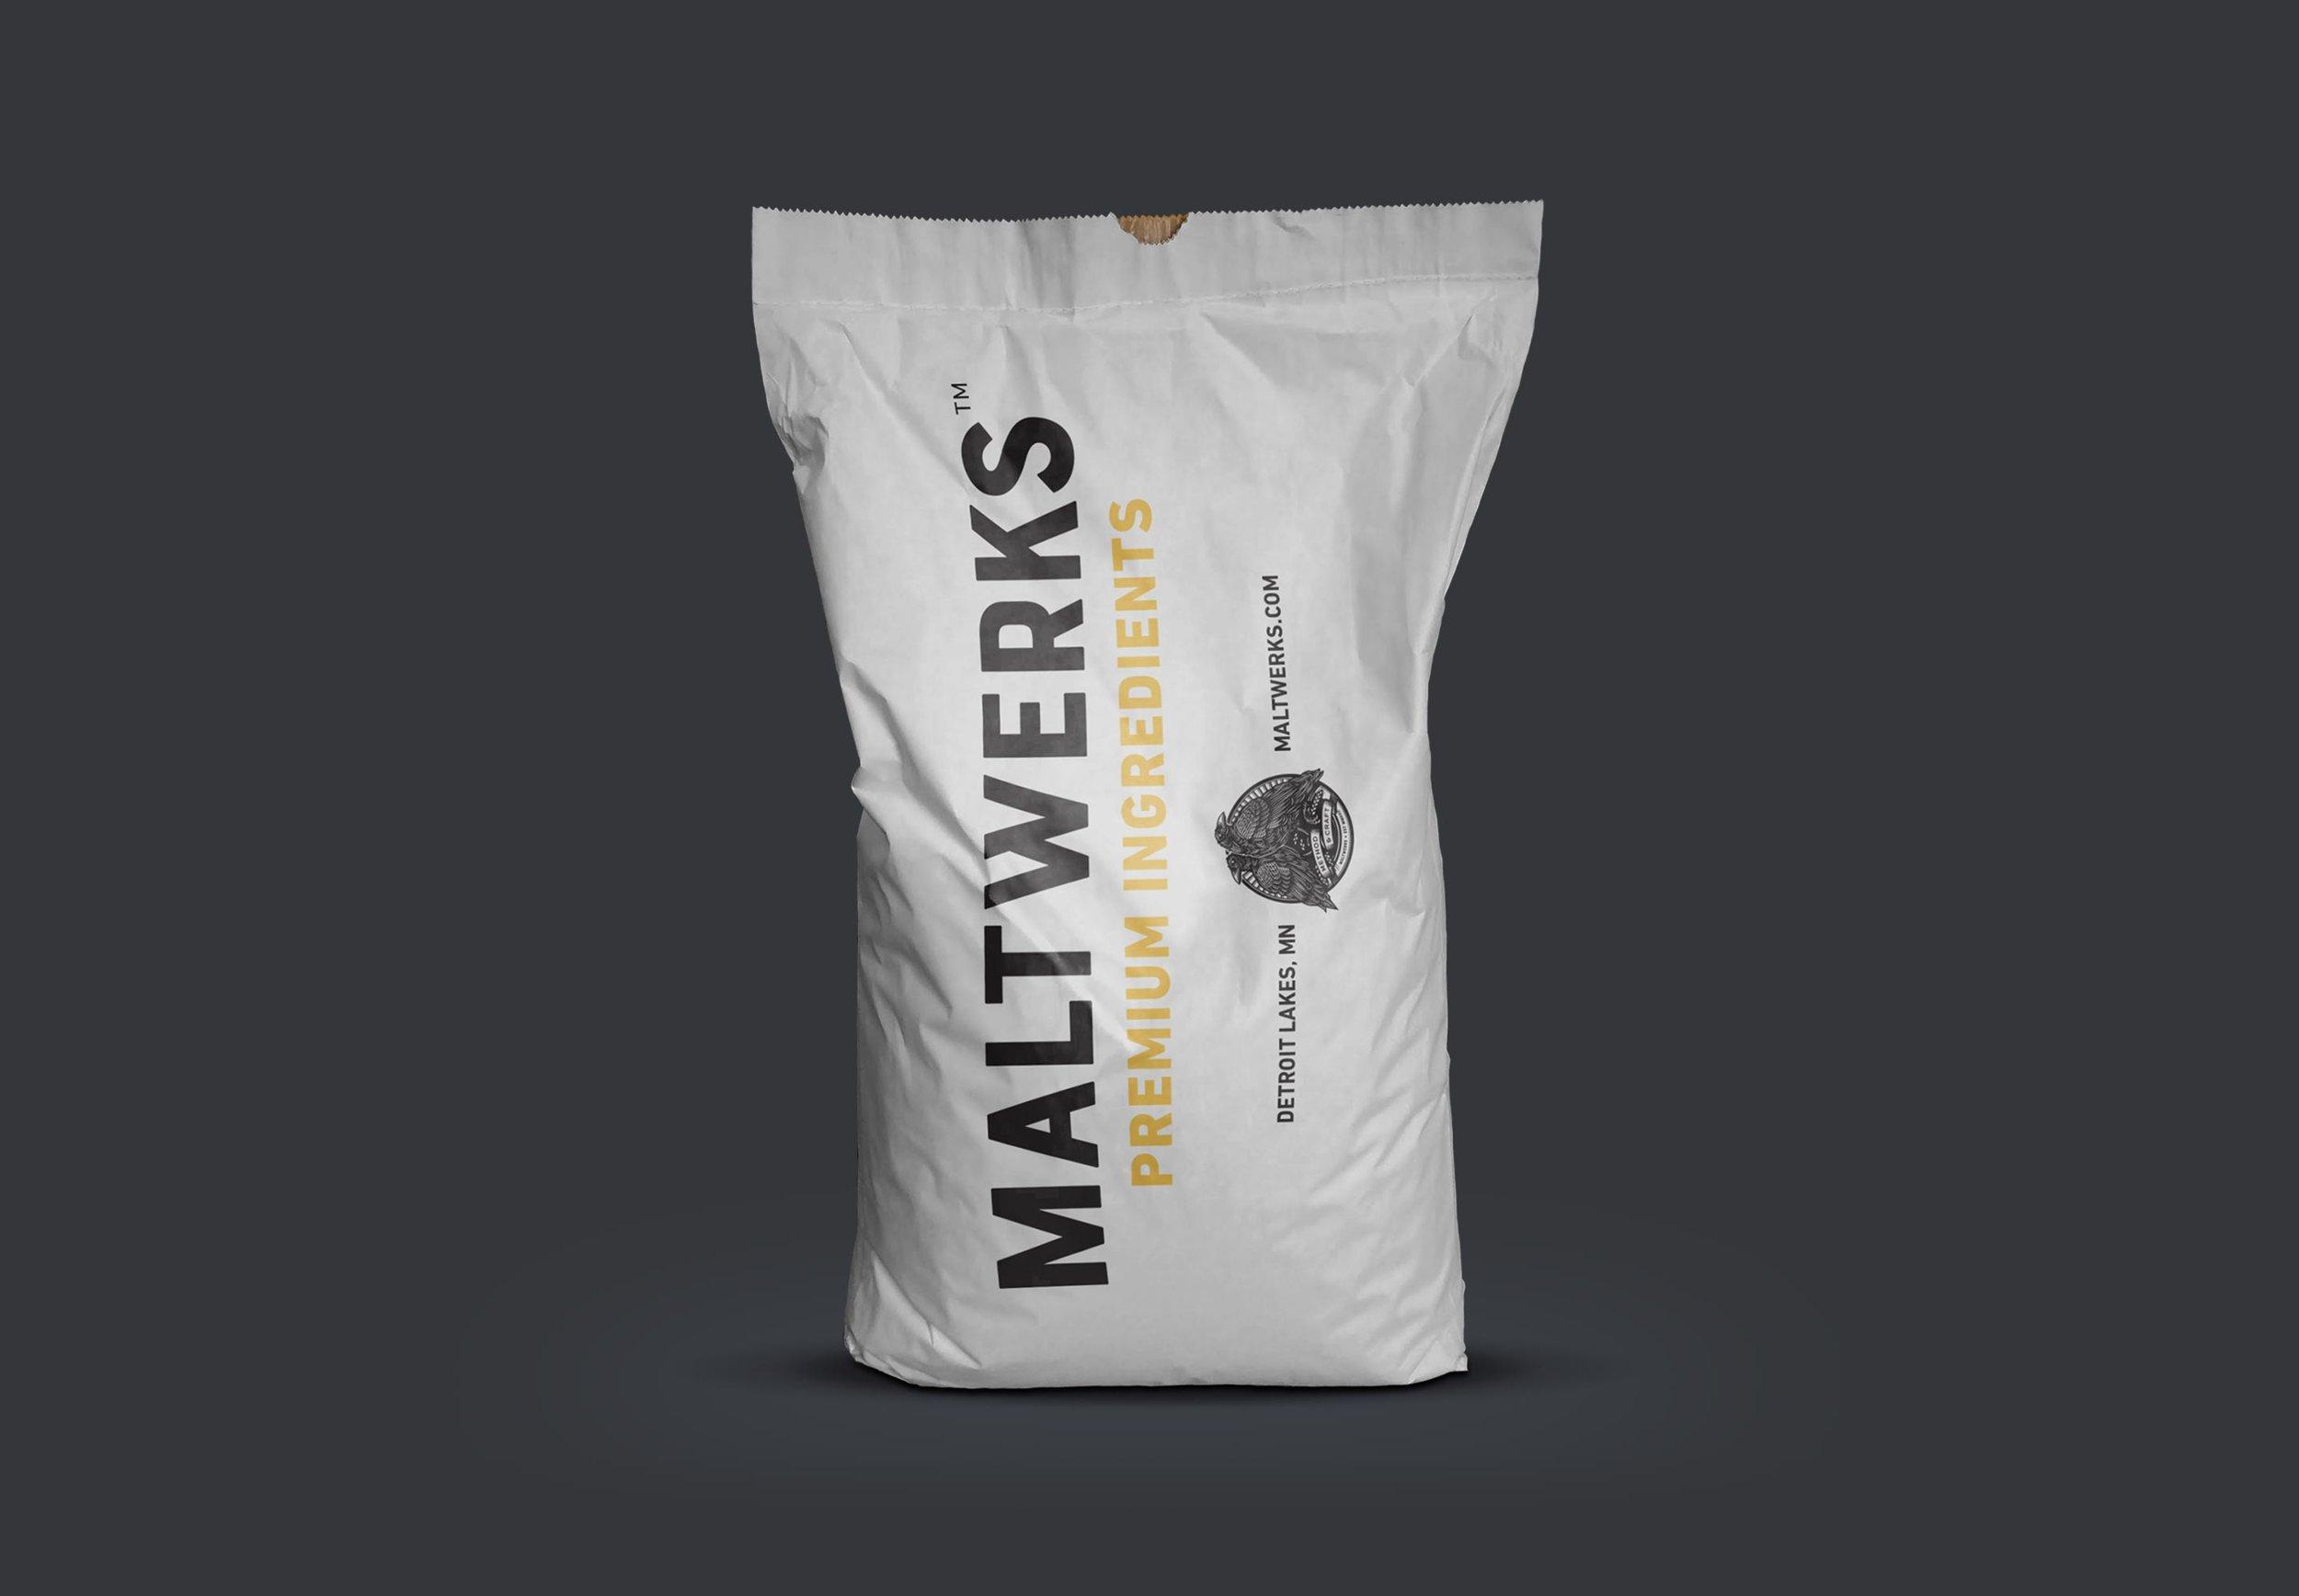 maltwerks-malt-bag.jpg